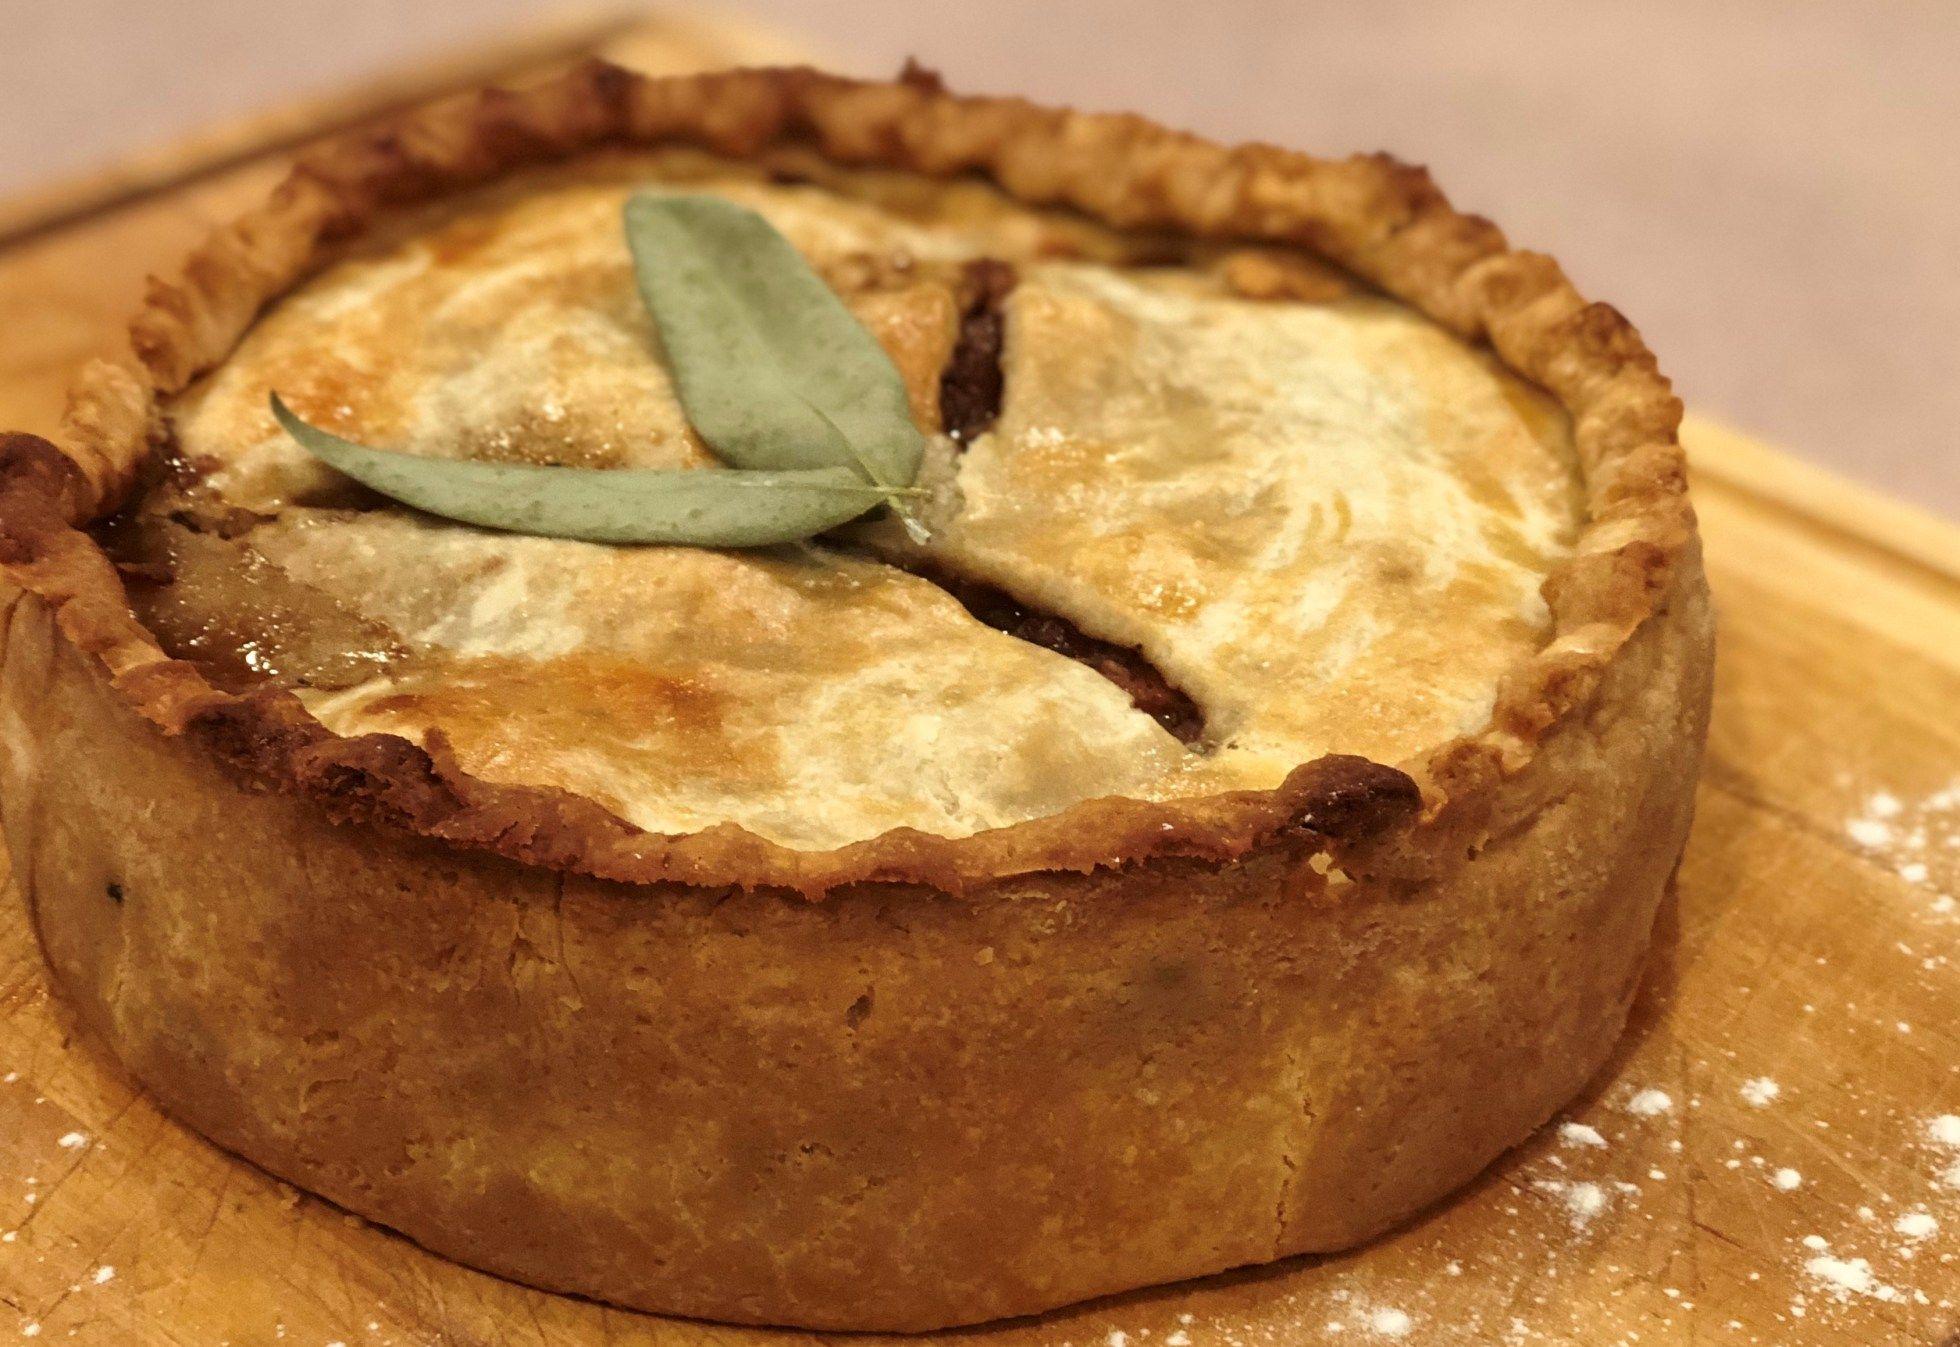 Steak and Ale Pie | Recipe | Food | Ale pie, Steak, ale, Pie